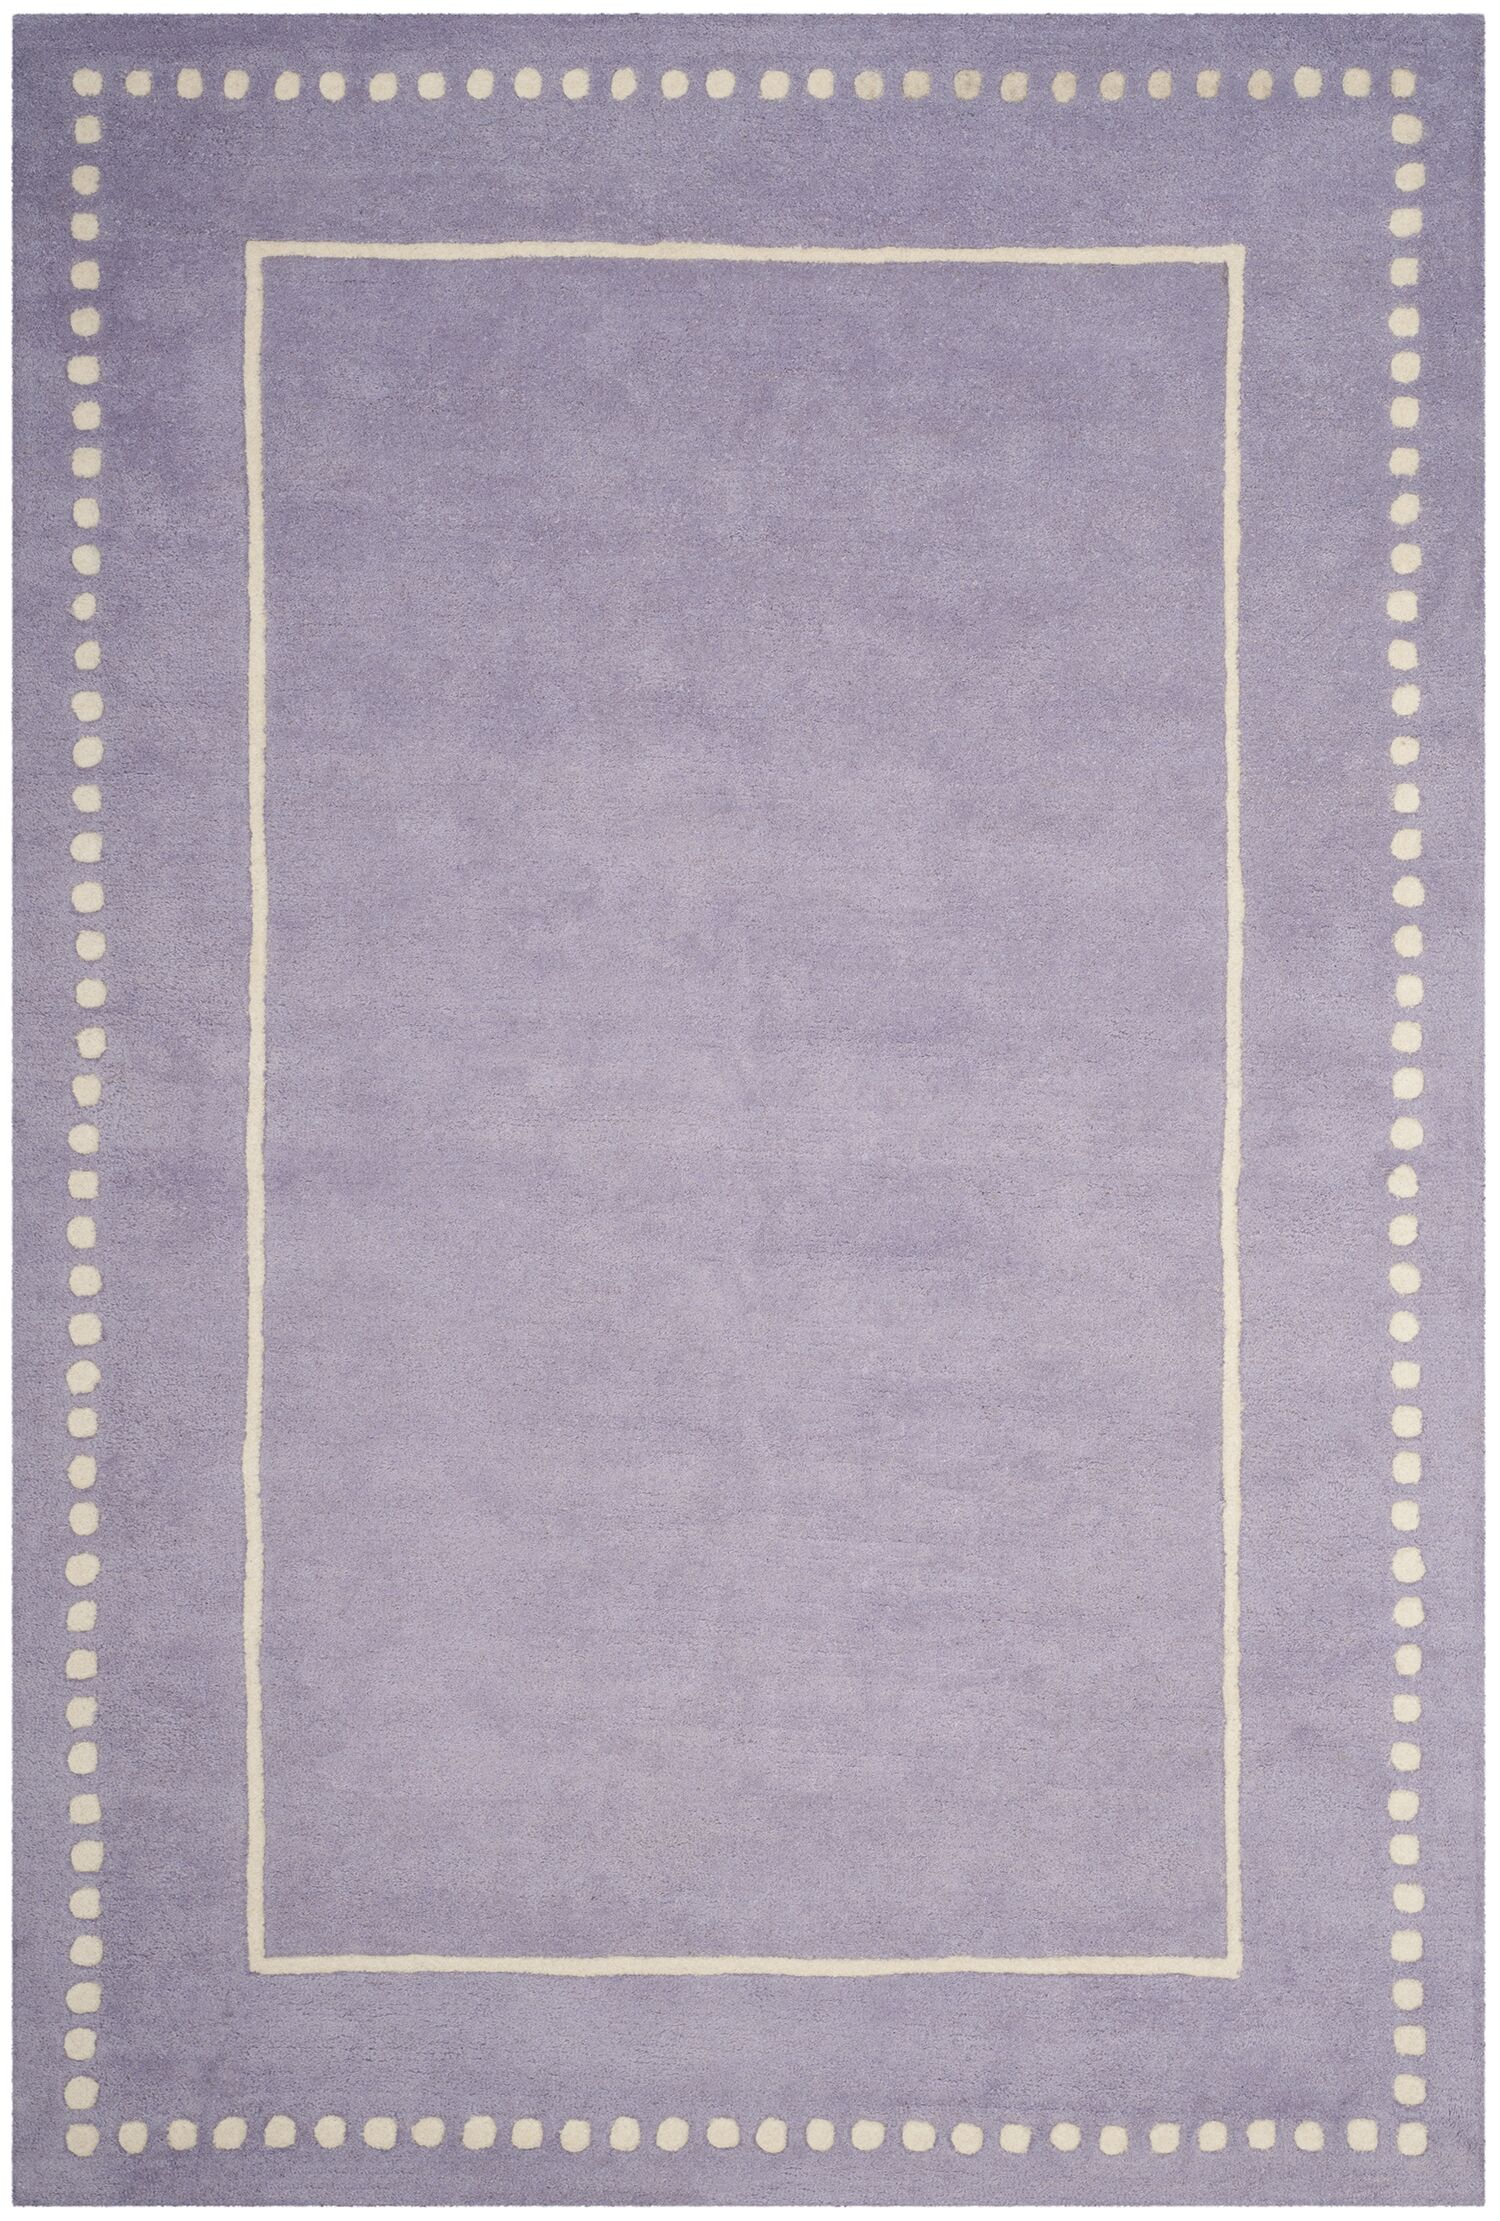 Amundson Hand-Tufted Gray Area Rug Rug Size: Rectangle 6' x 9'